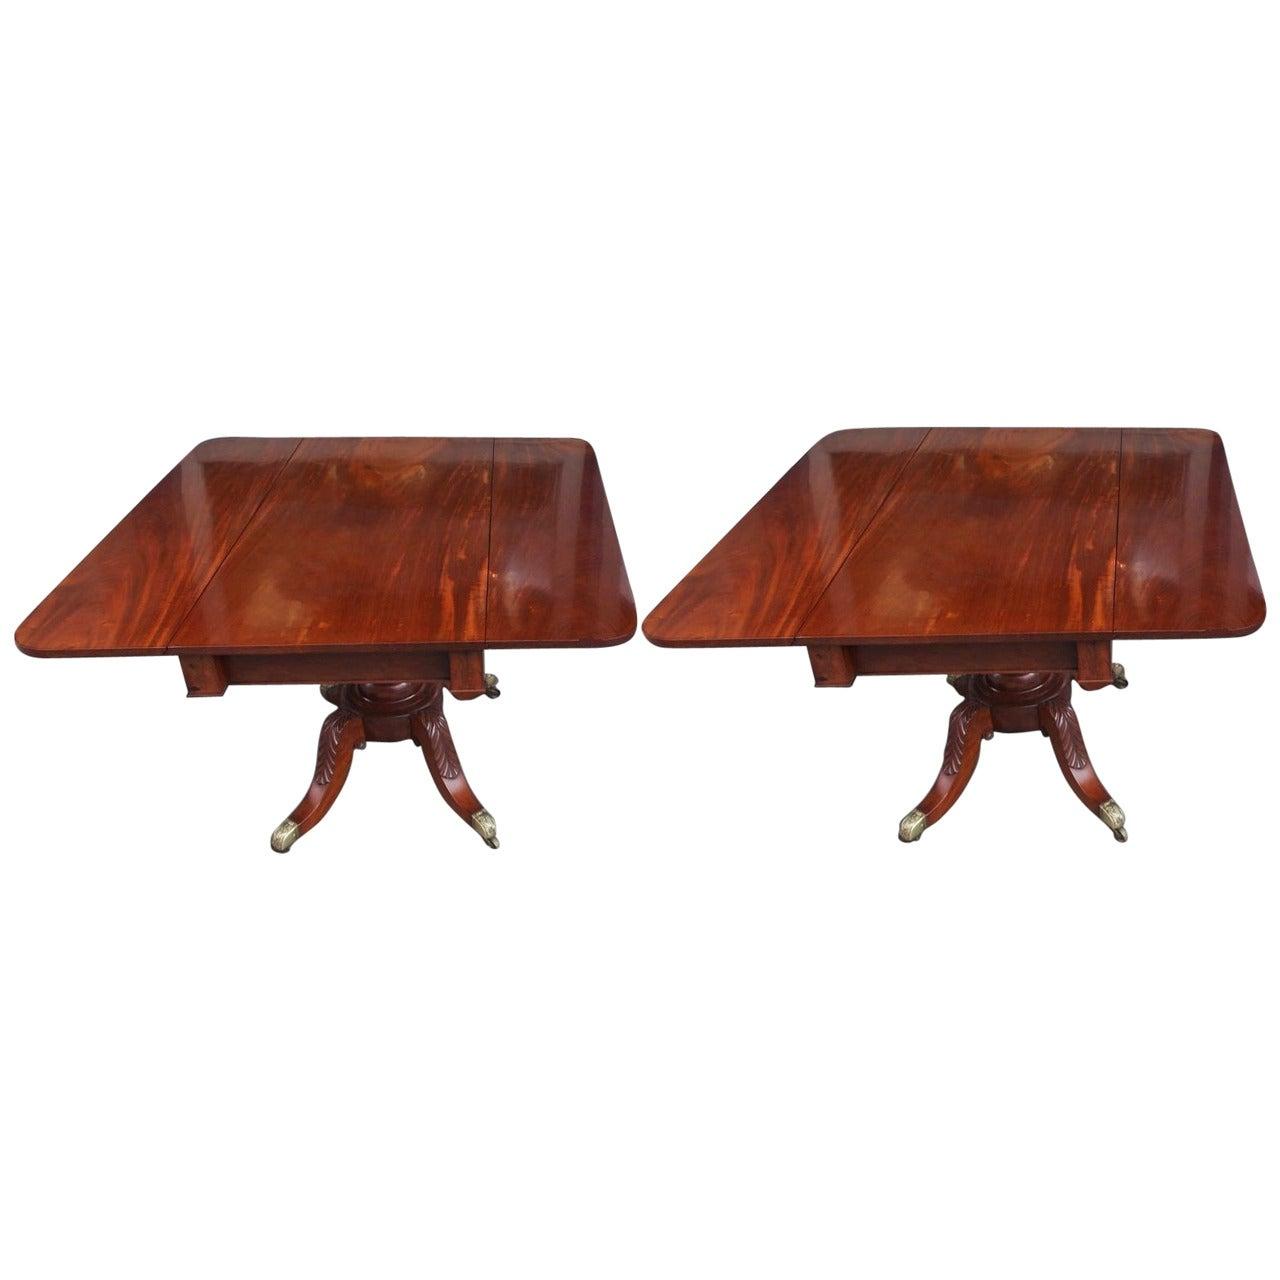 Pair of American Mahogany Pedestal Card Tables. Philadelphia, Circa 1820